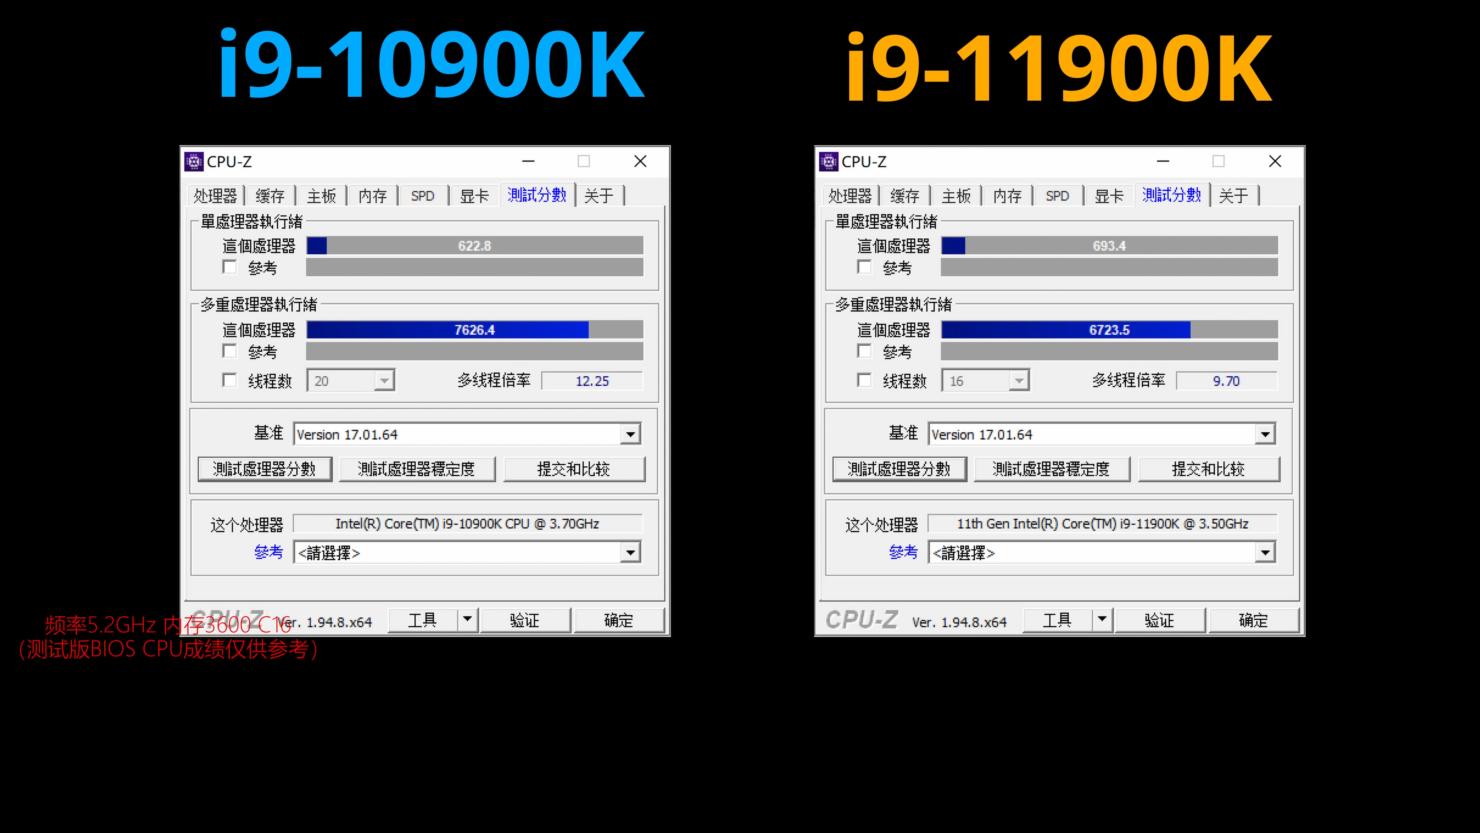 intel-core-i9-11900k-8-core-rocket-lake-vs-core-i9-10900k-10-core-comet-lake-cpu-_-5-2-ghz-overclock-_-cpuz